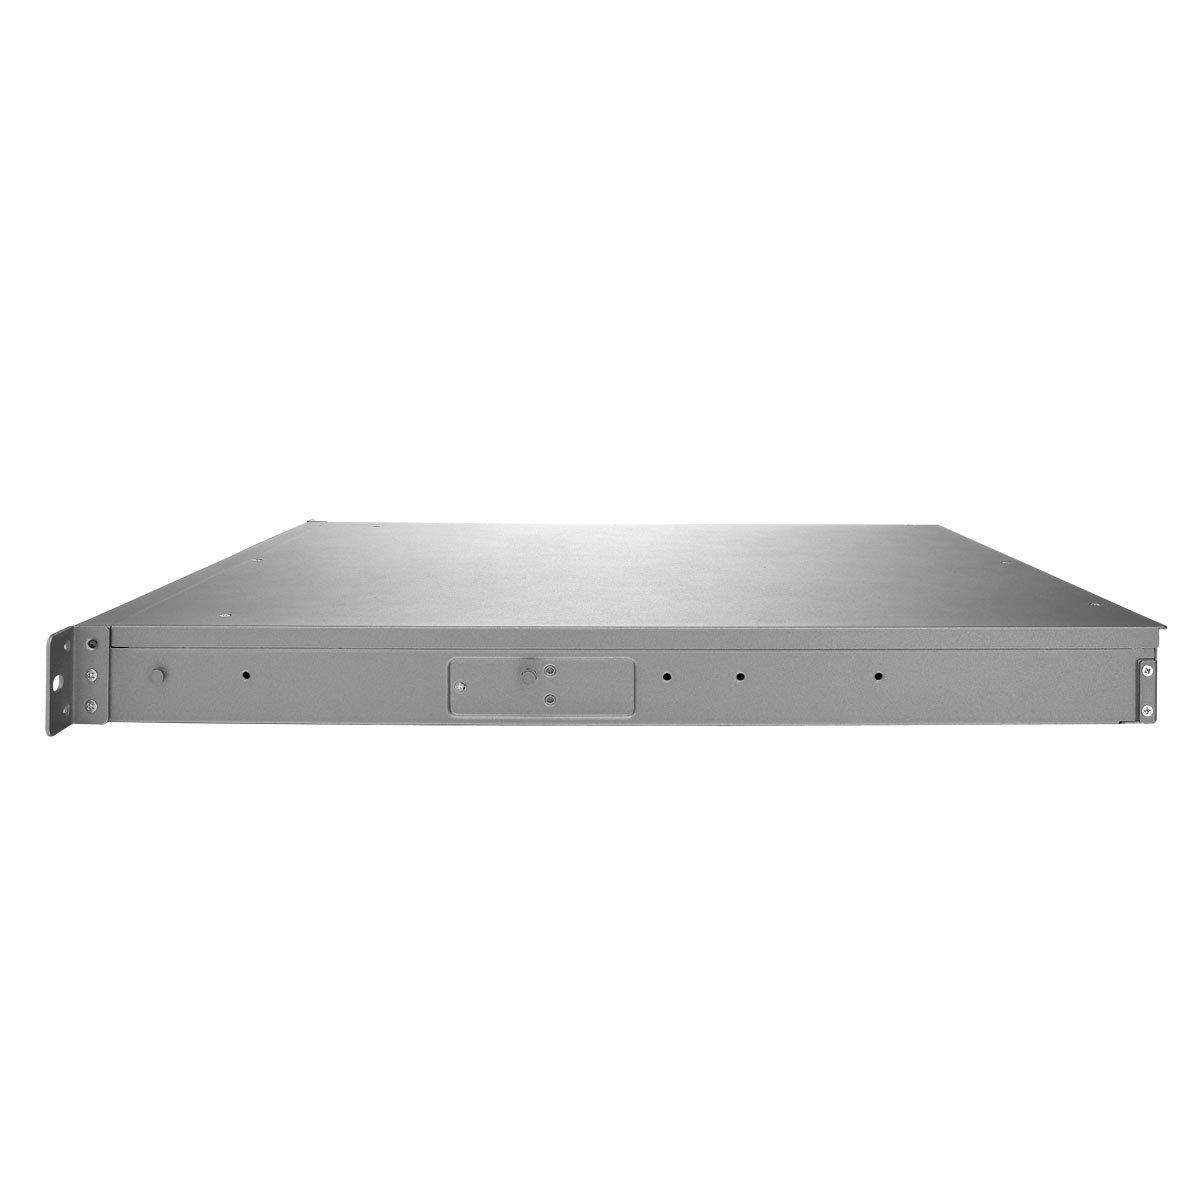 QNAP TS 453U RP 4 bay 1U iSCSI NAS, Intel 2.0GHz Quad Core CPU with 4GB RAM, 2.5''/3.5'' SATA 6Gb/s by QNAP (Image #3)